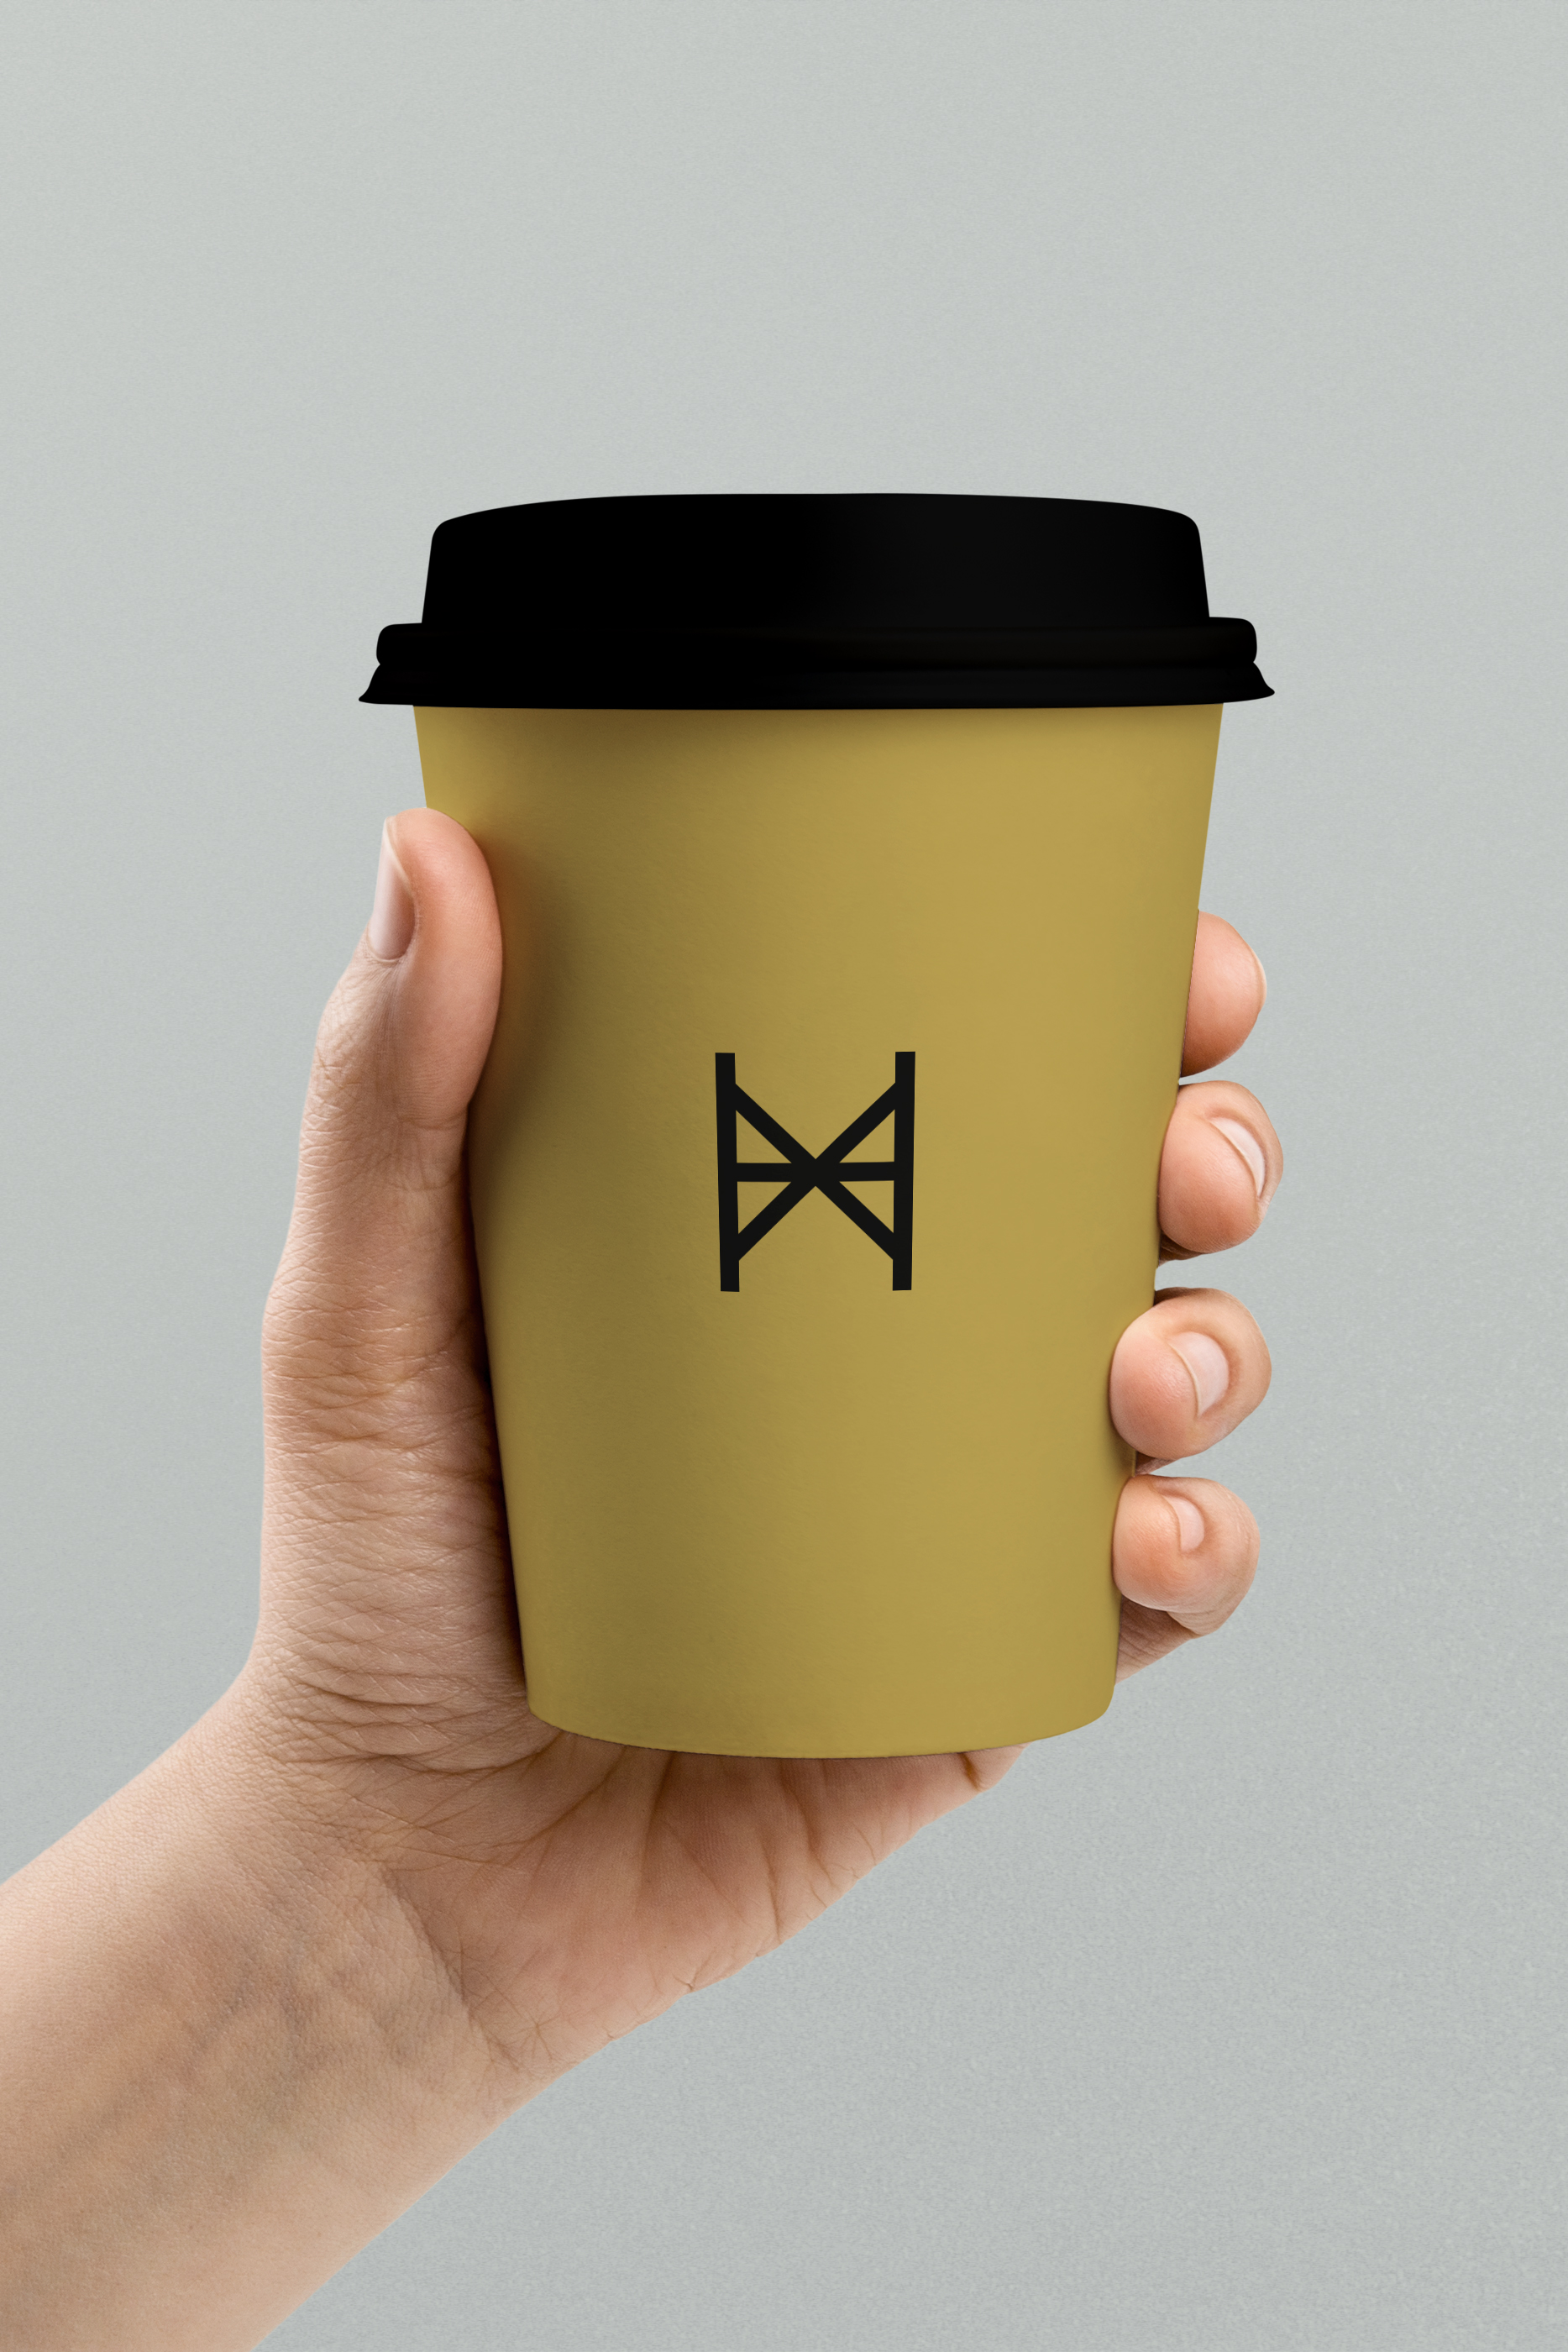 kaffekopp_gul_staende